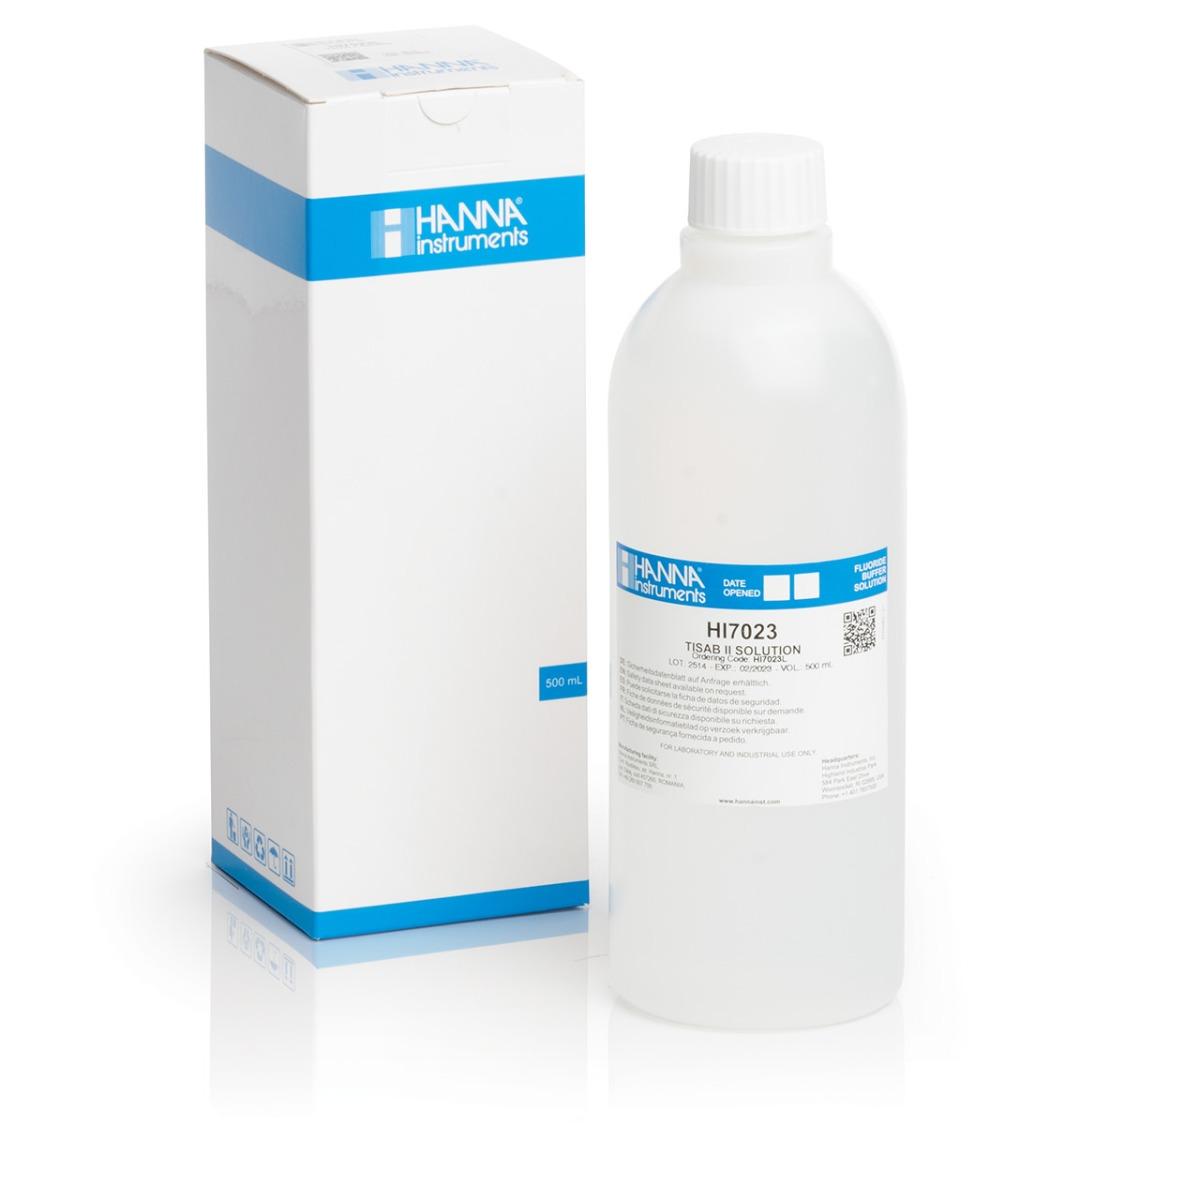 HI7023/1L TISAB Solution for Fluoride Analysis (1L)